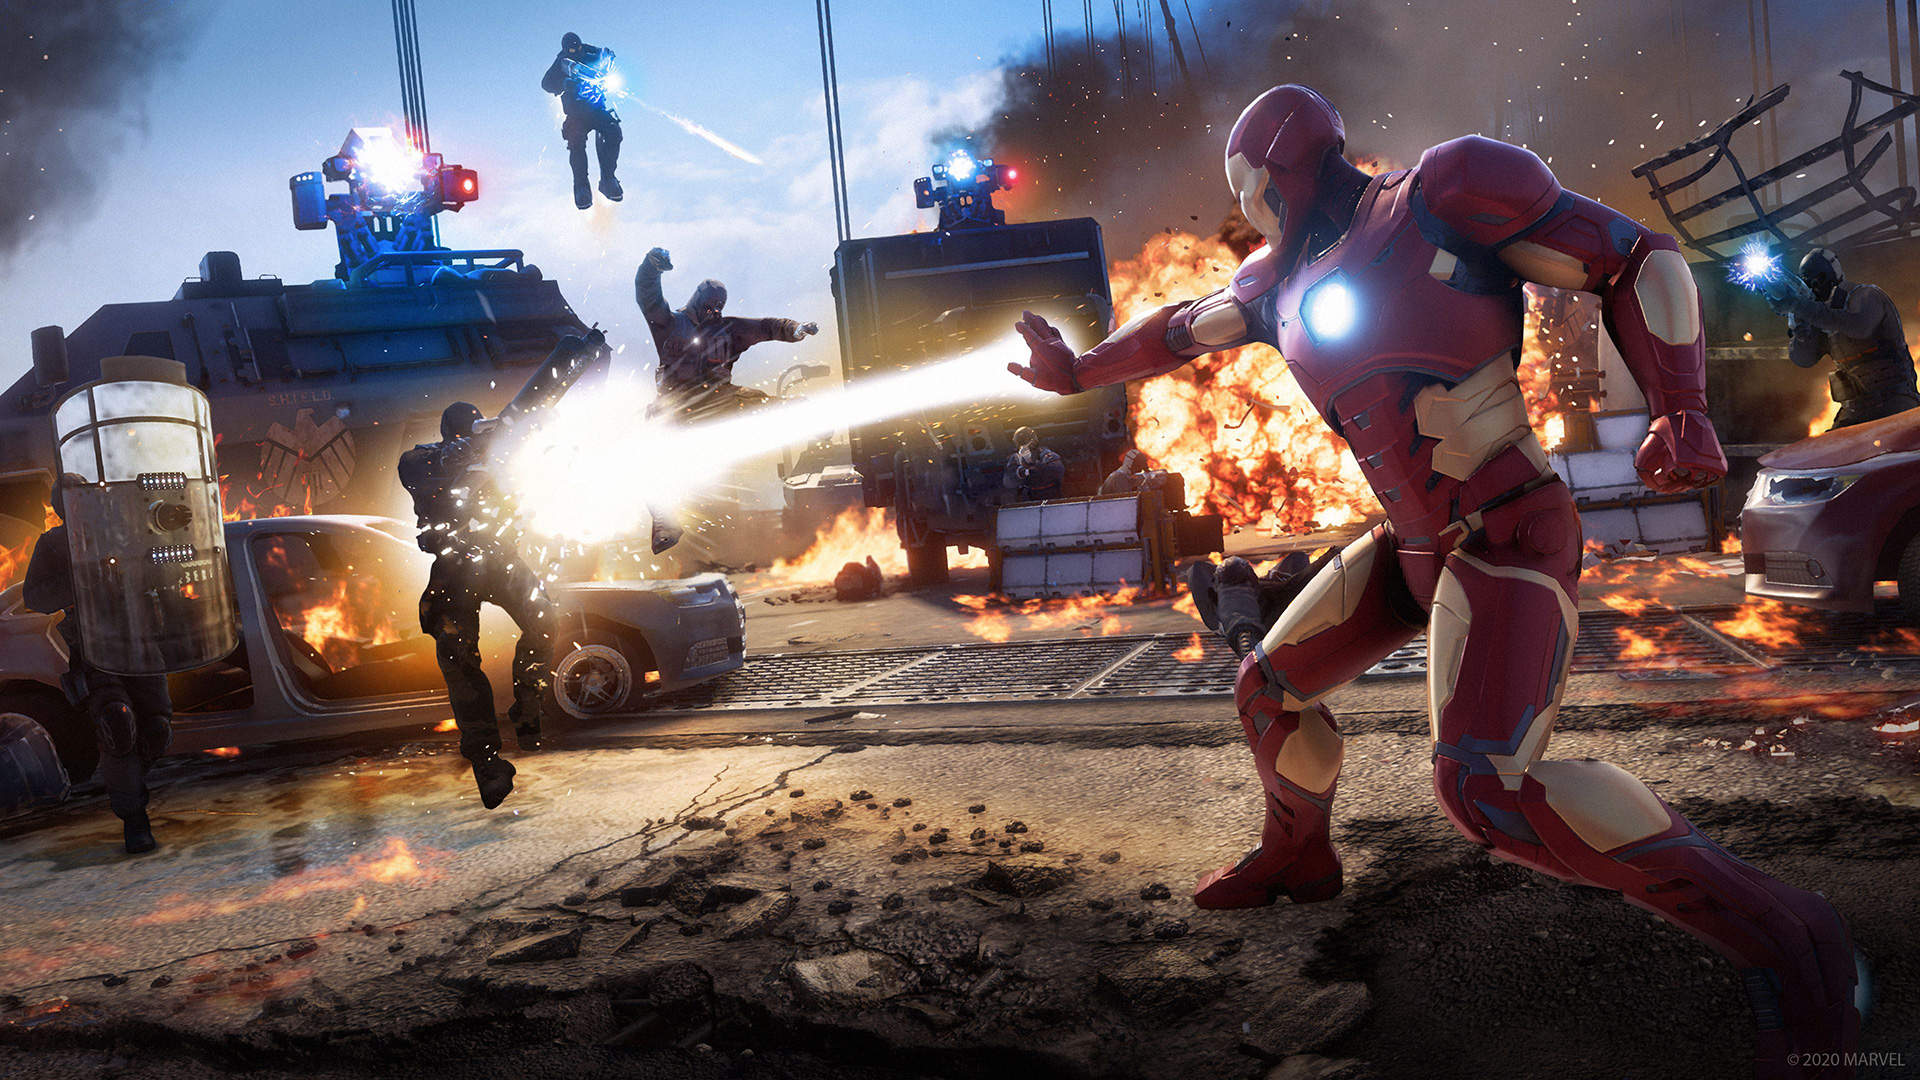 Marvel-Avengers-Combat-Iron-Man-Debut game